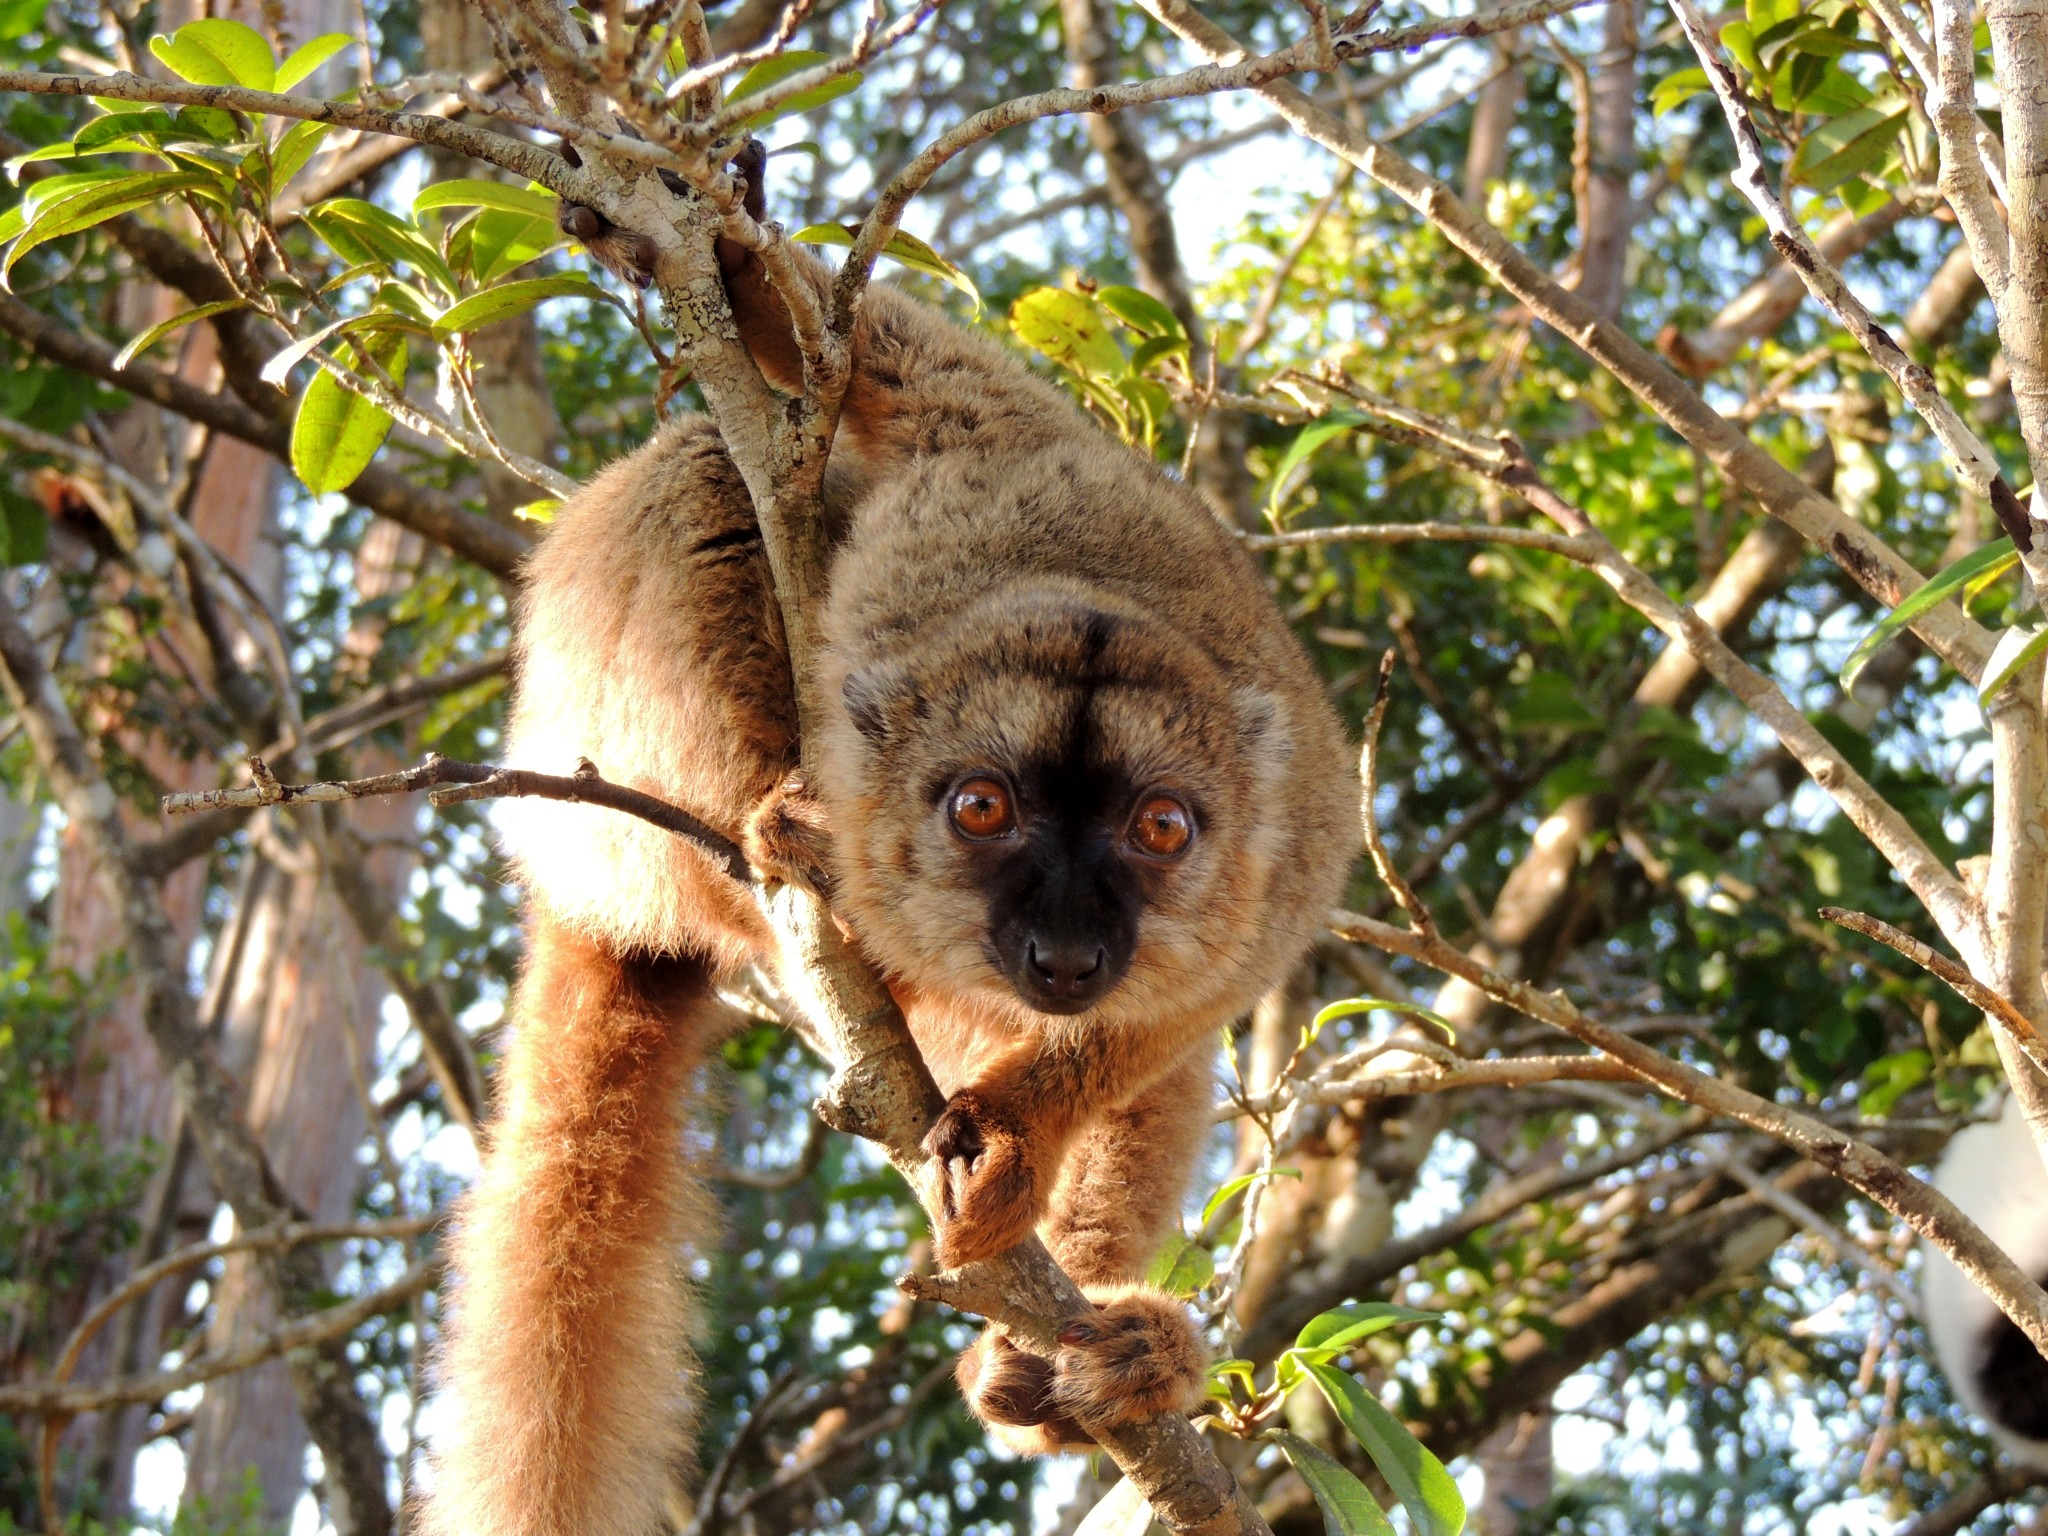 Madagascar, common brown lemur